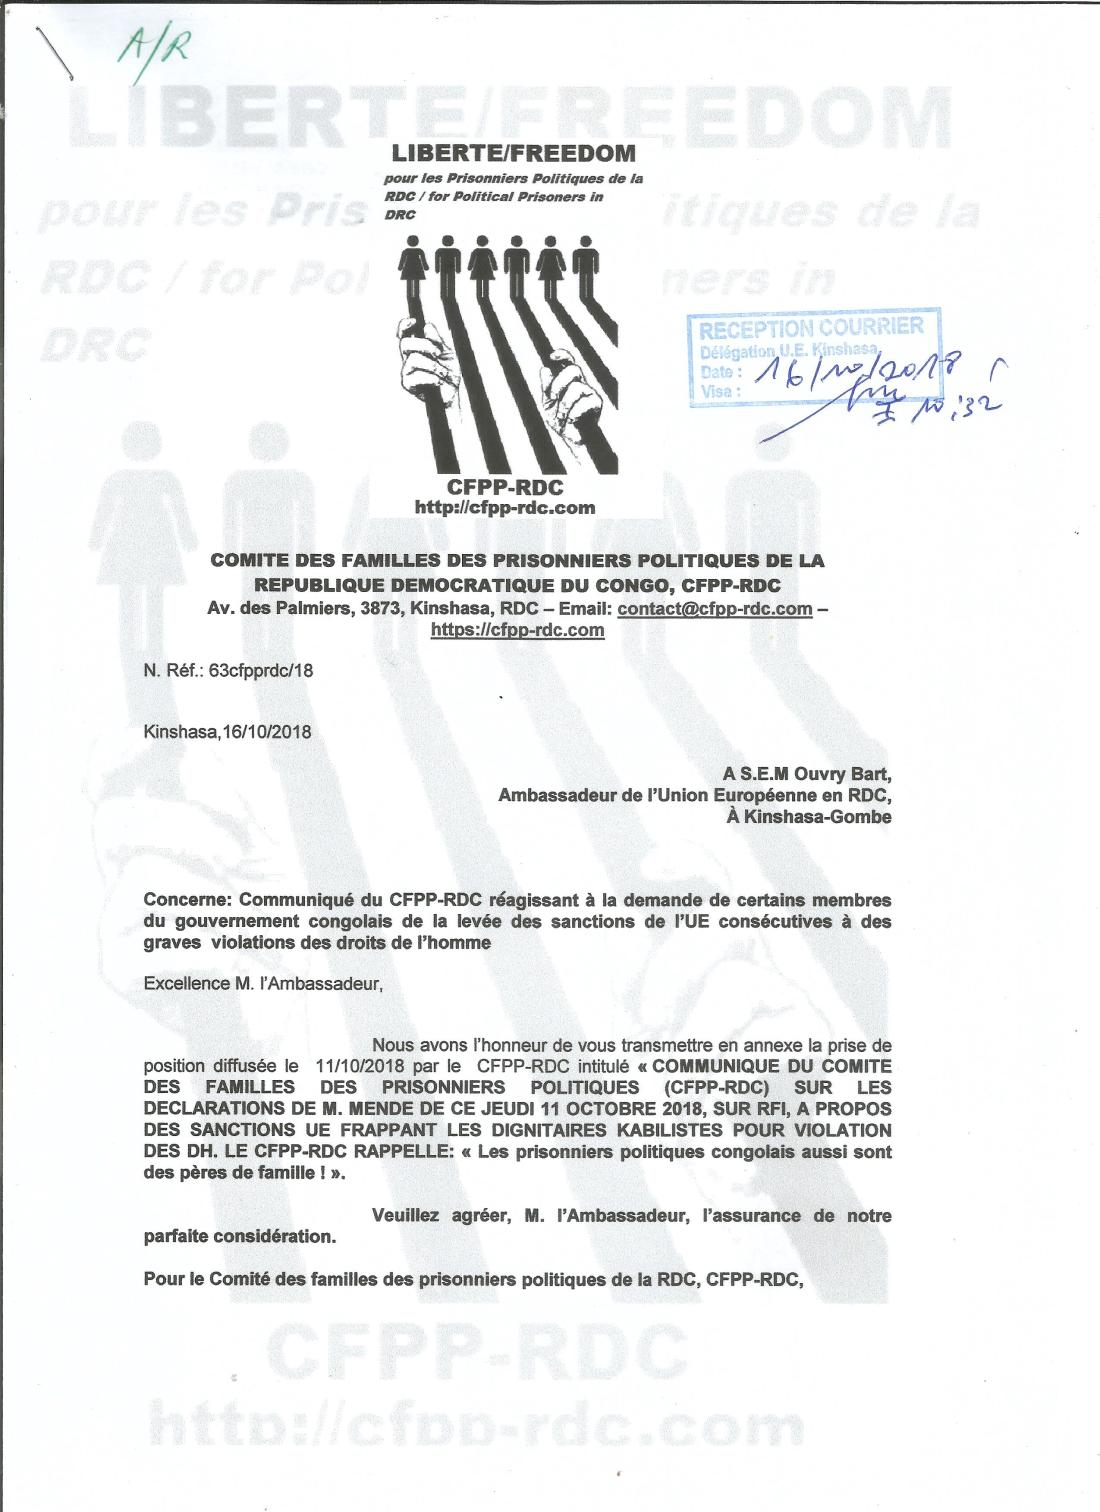 LETTRE A SEM L AMBASSADEUR UE - CFFP 1610180001